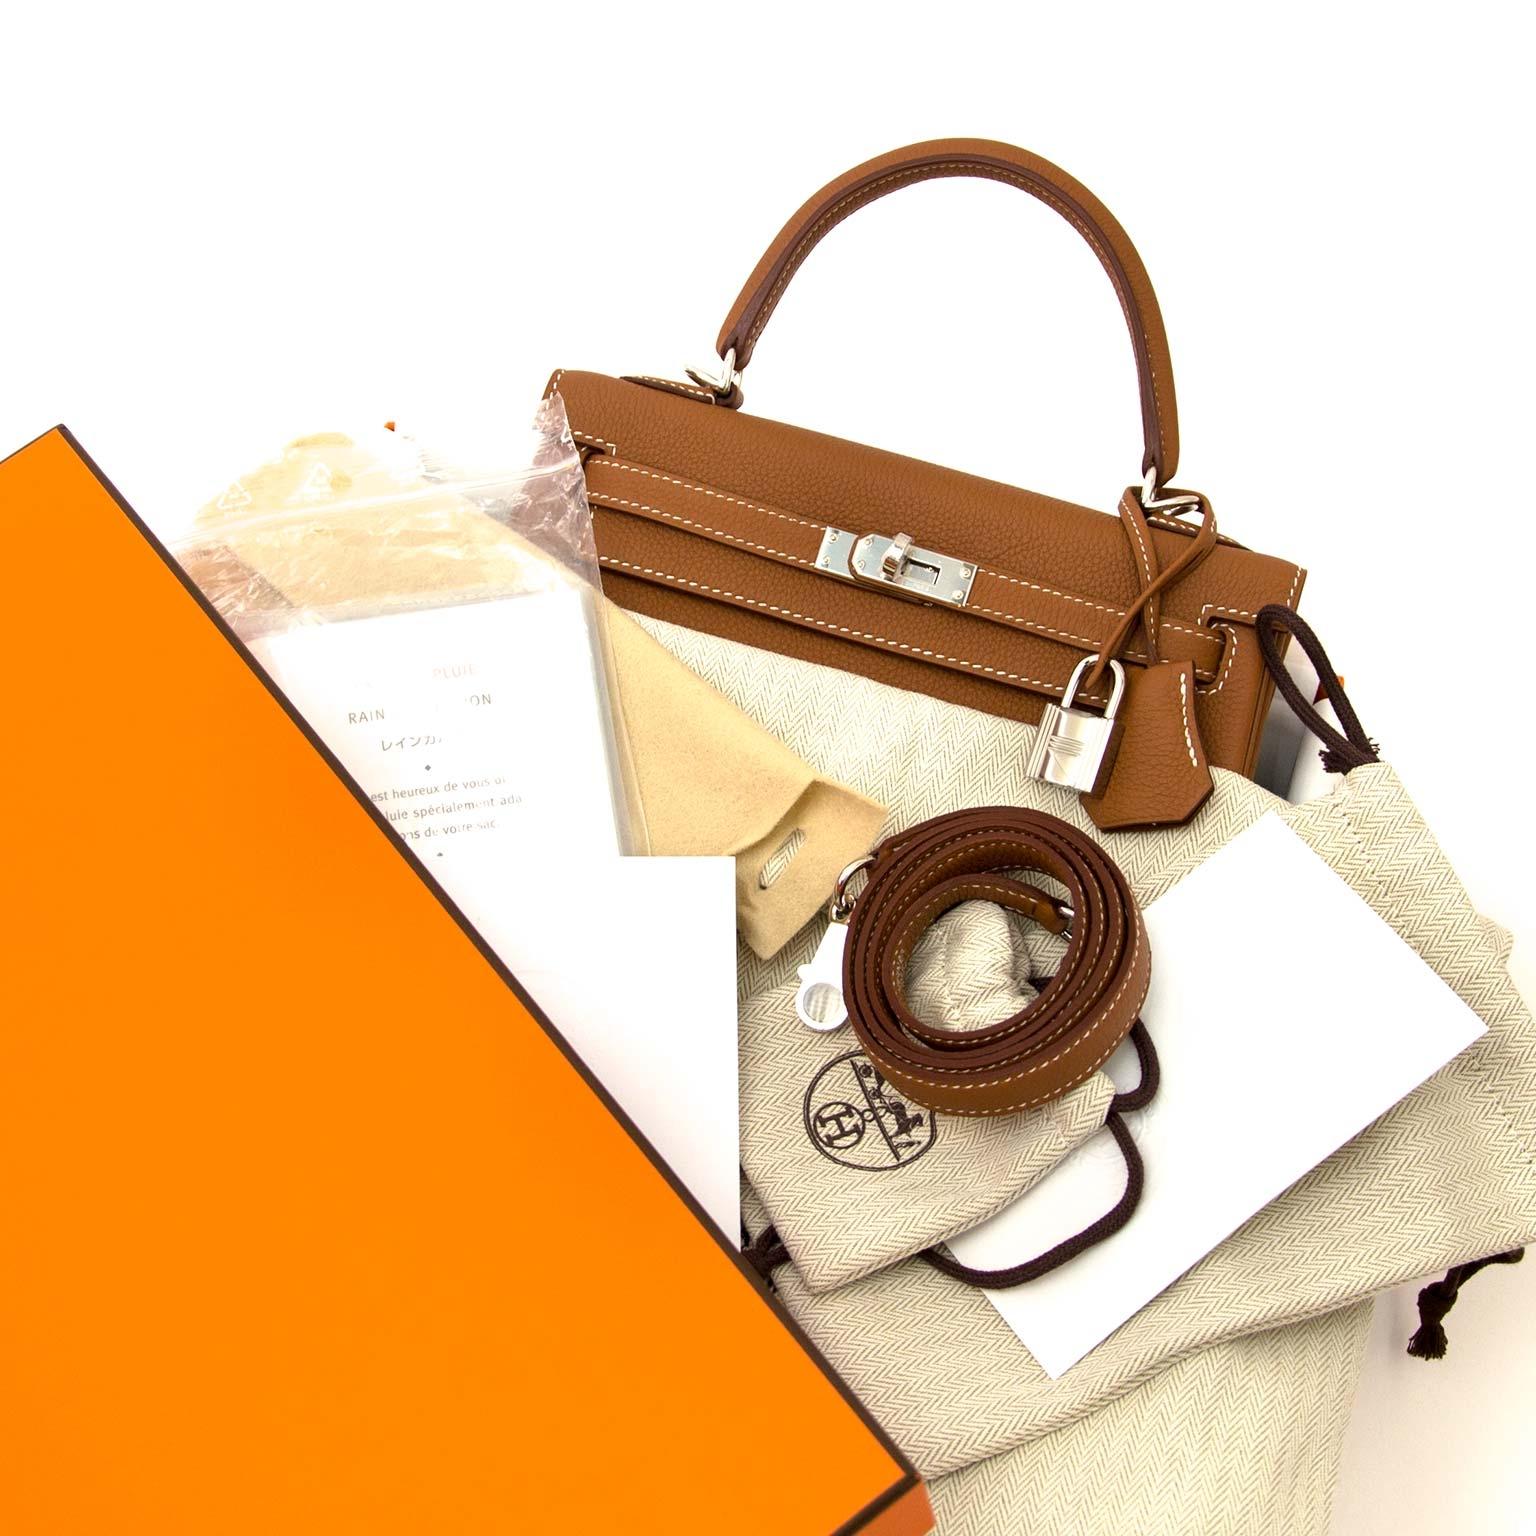 38039389655 ... Hermès Kelly 25 Gold Togo PHW now online at labellov.com 100% authentic  designer